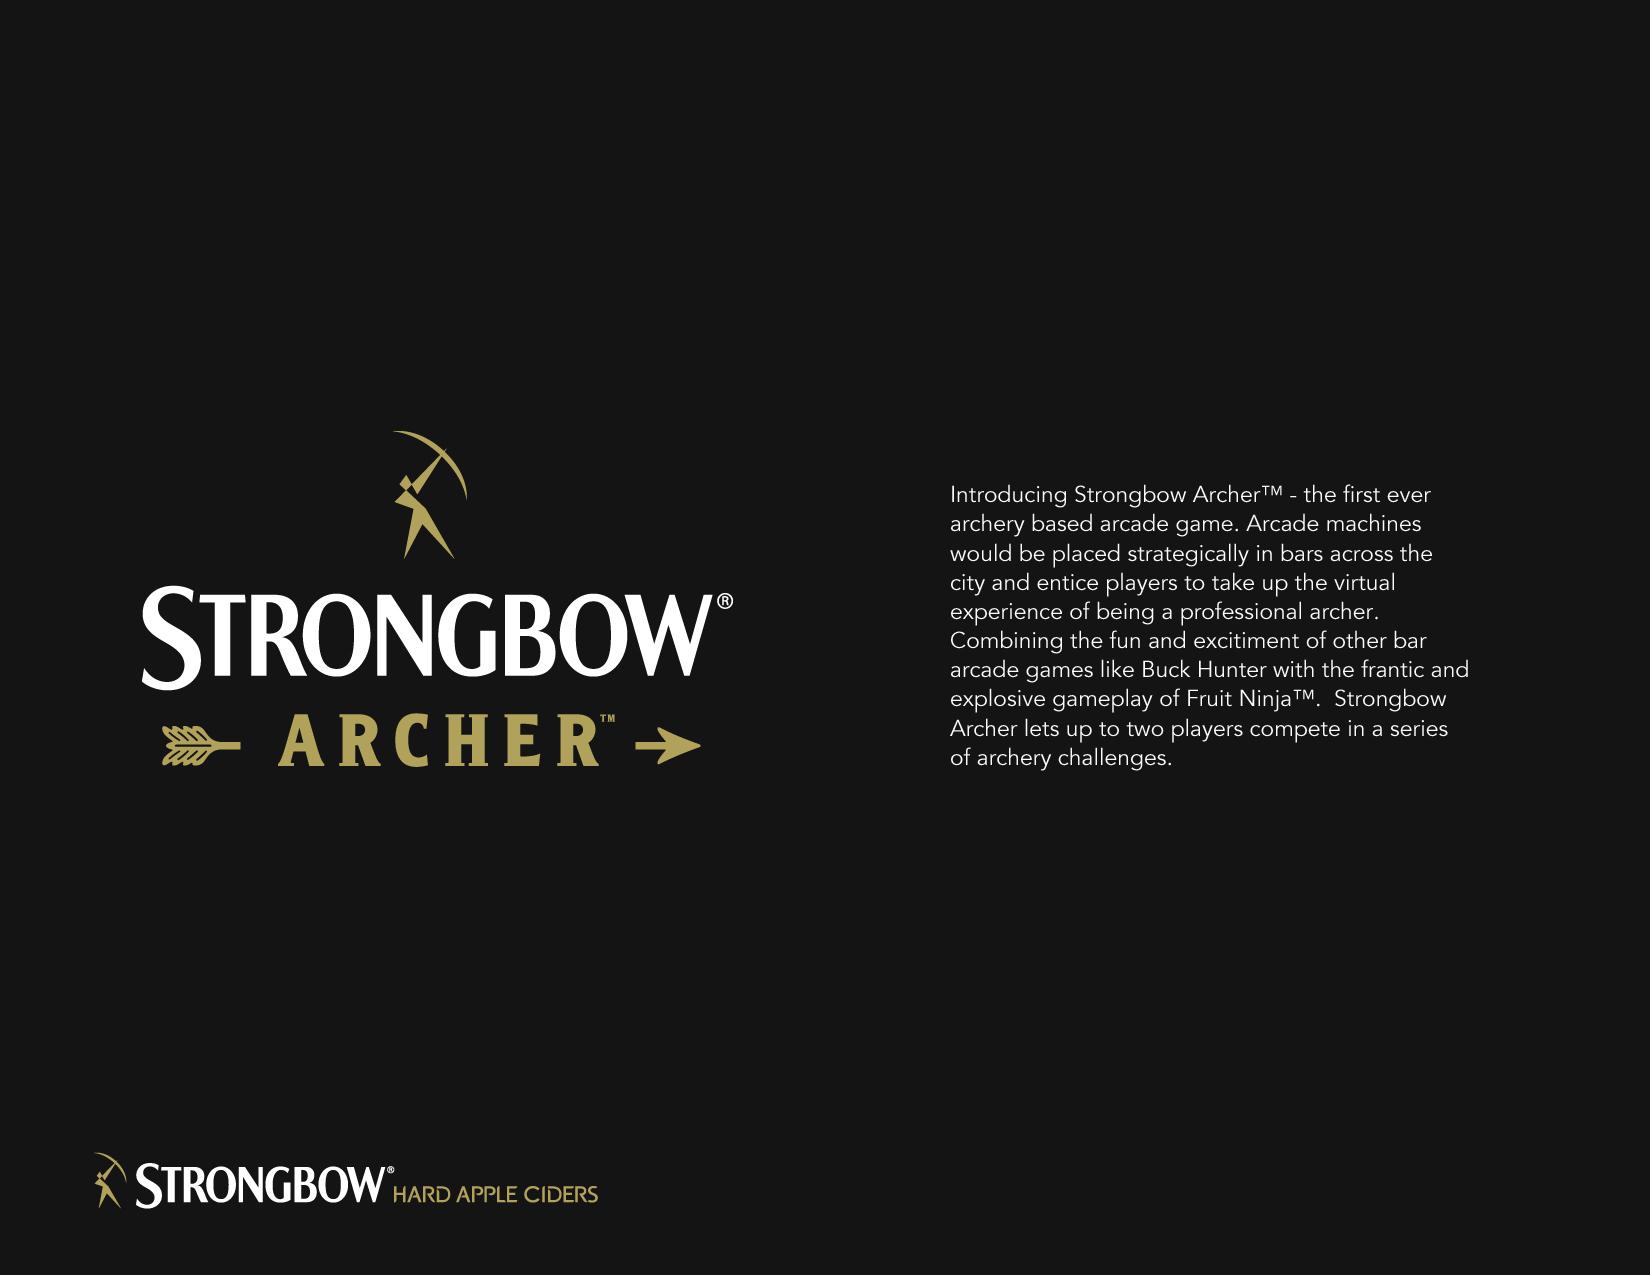 Strongbow_ArcherGame_Title.jpg